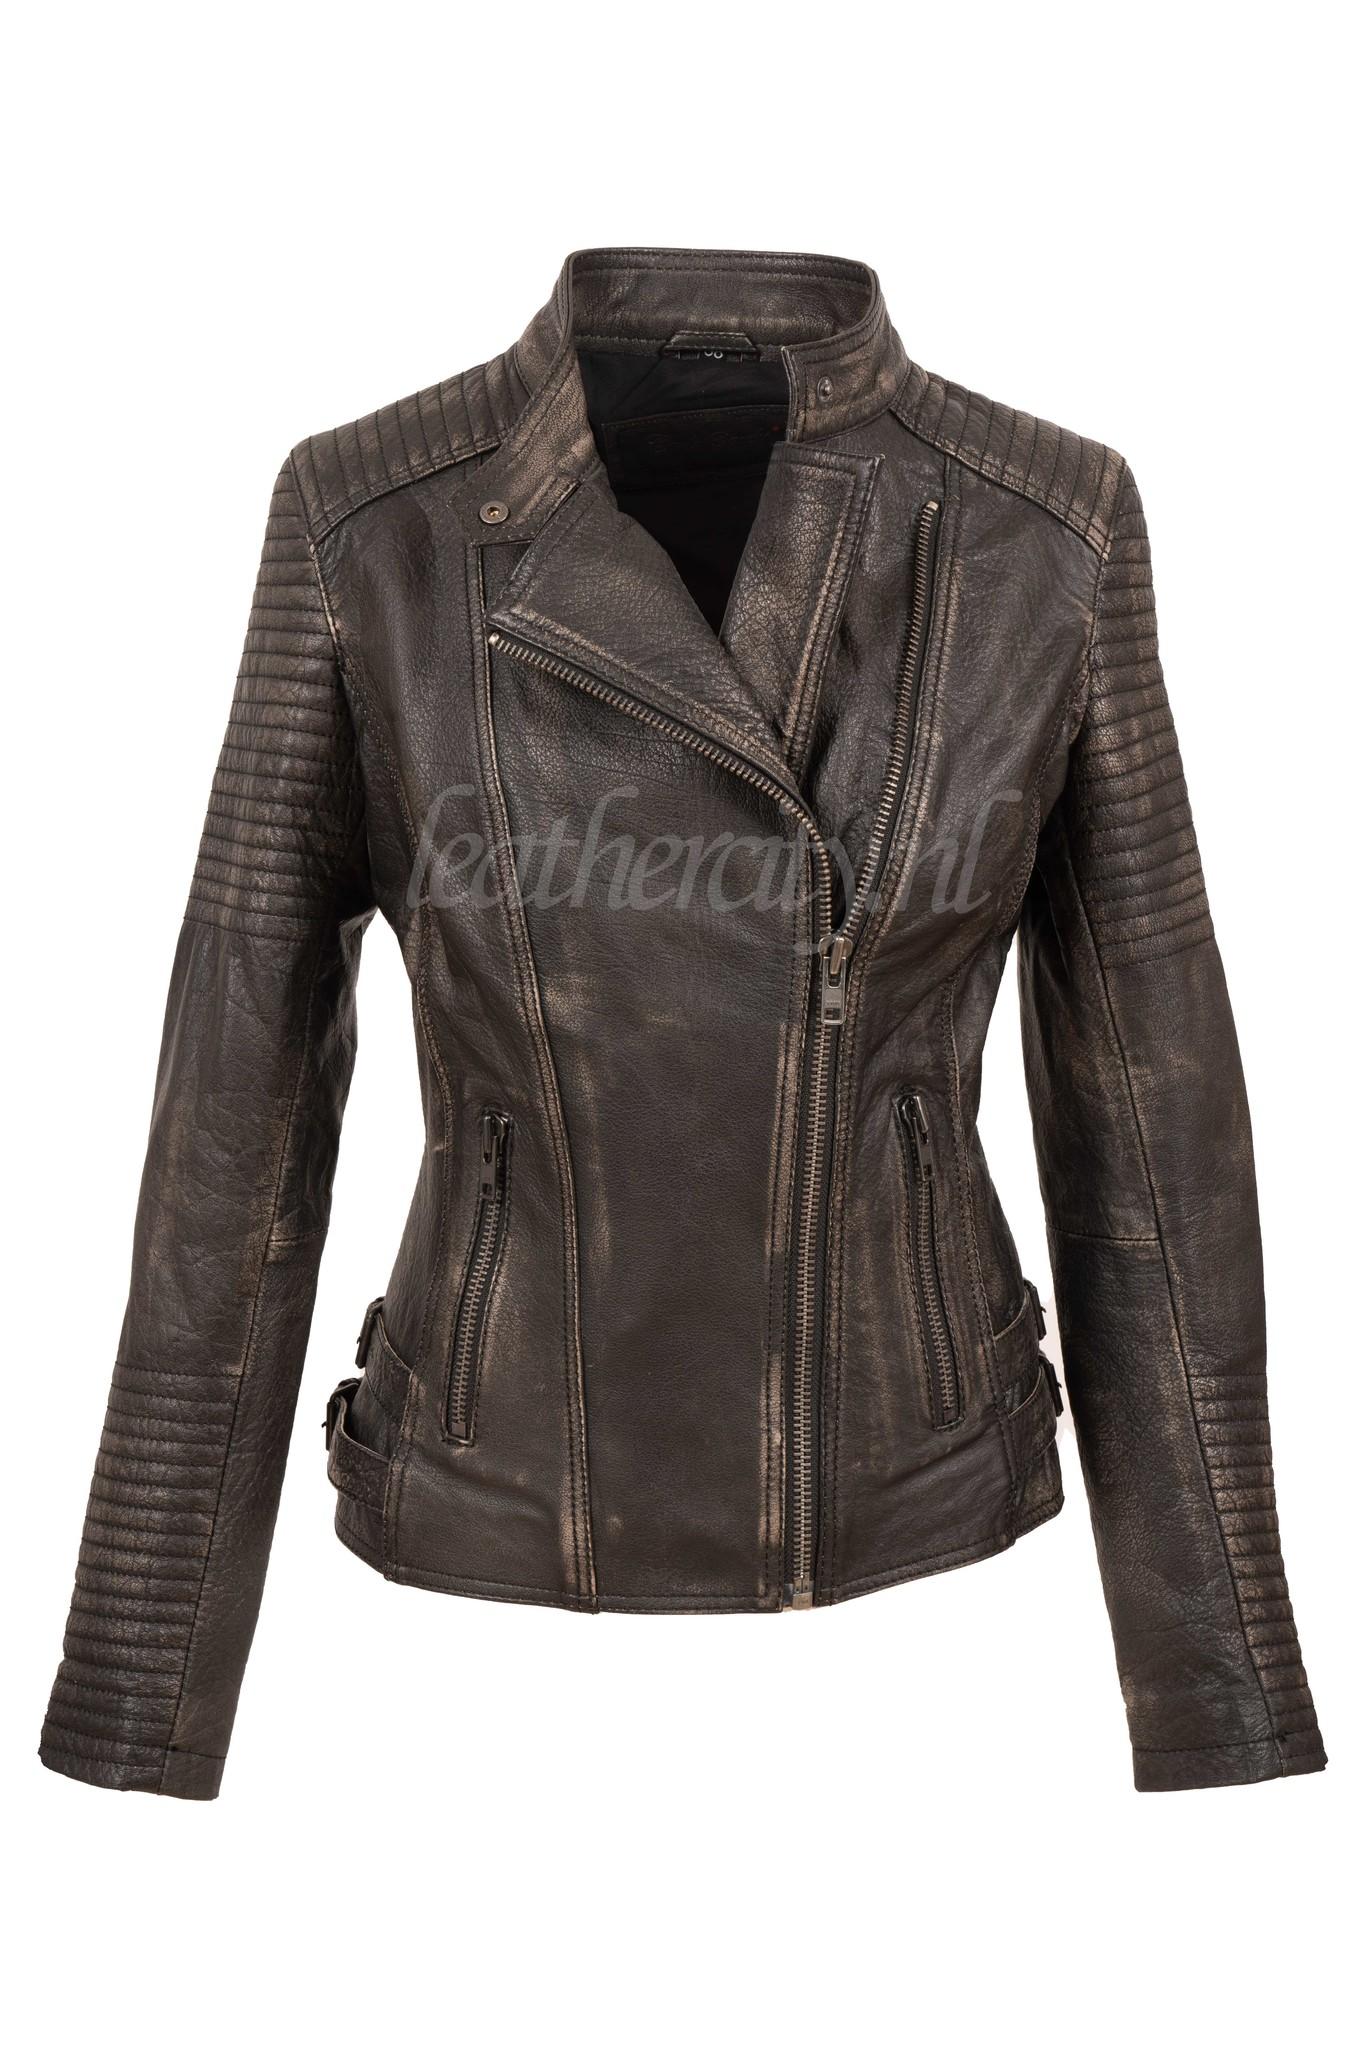 Carlo Sacchi Leren biker jas dames  zwart bruin